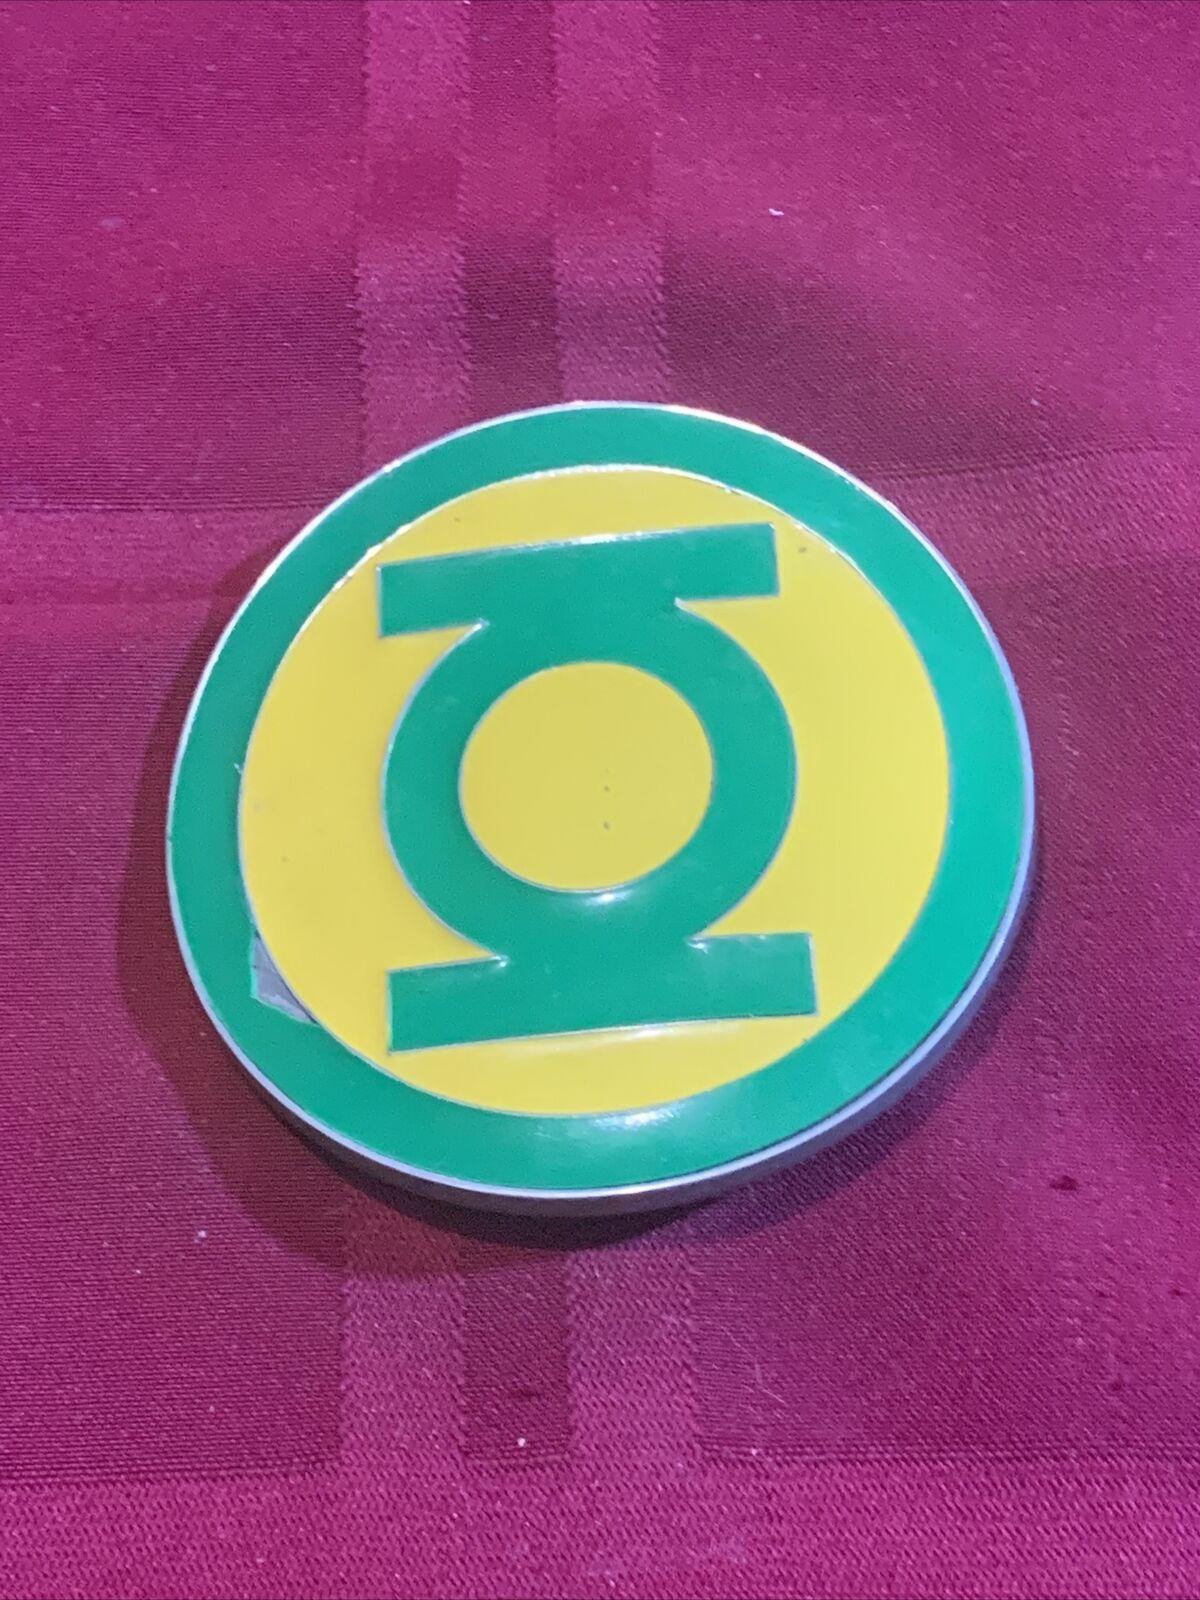 Green Lantern Comics Yellow Super Hero Belt Buckle